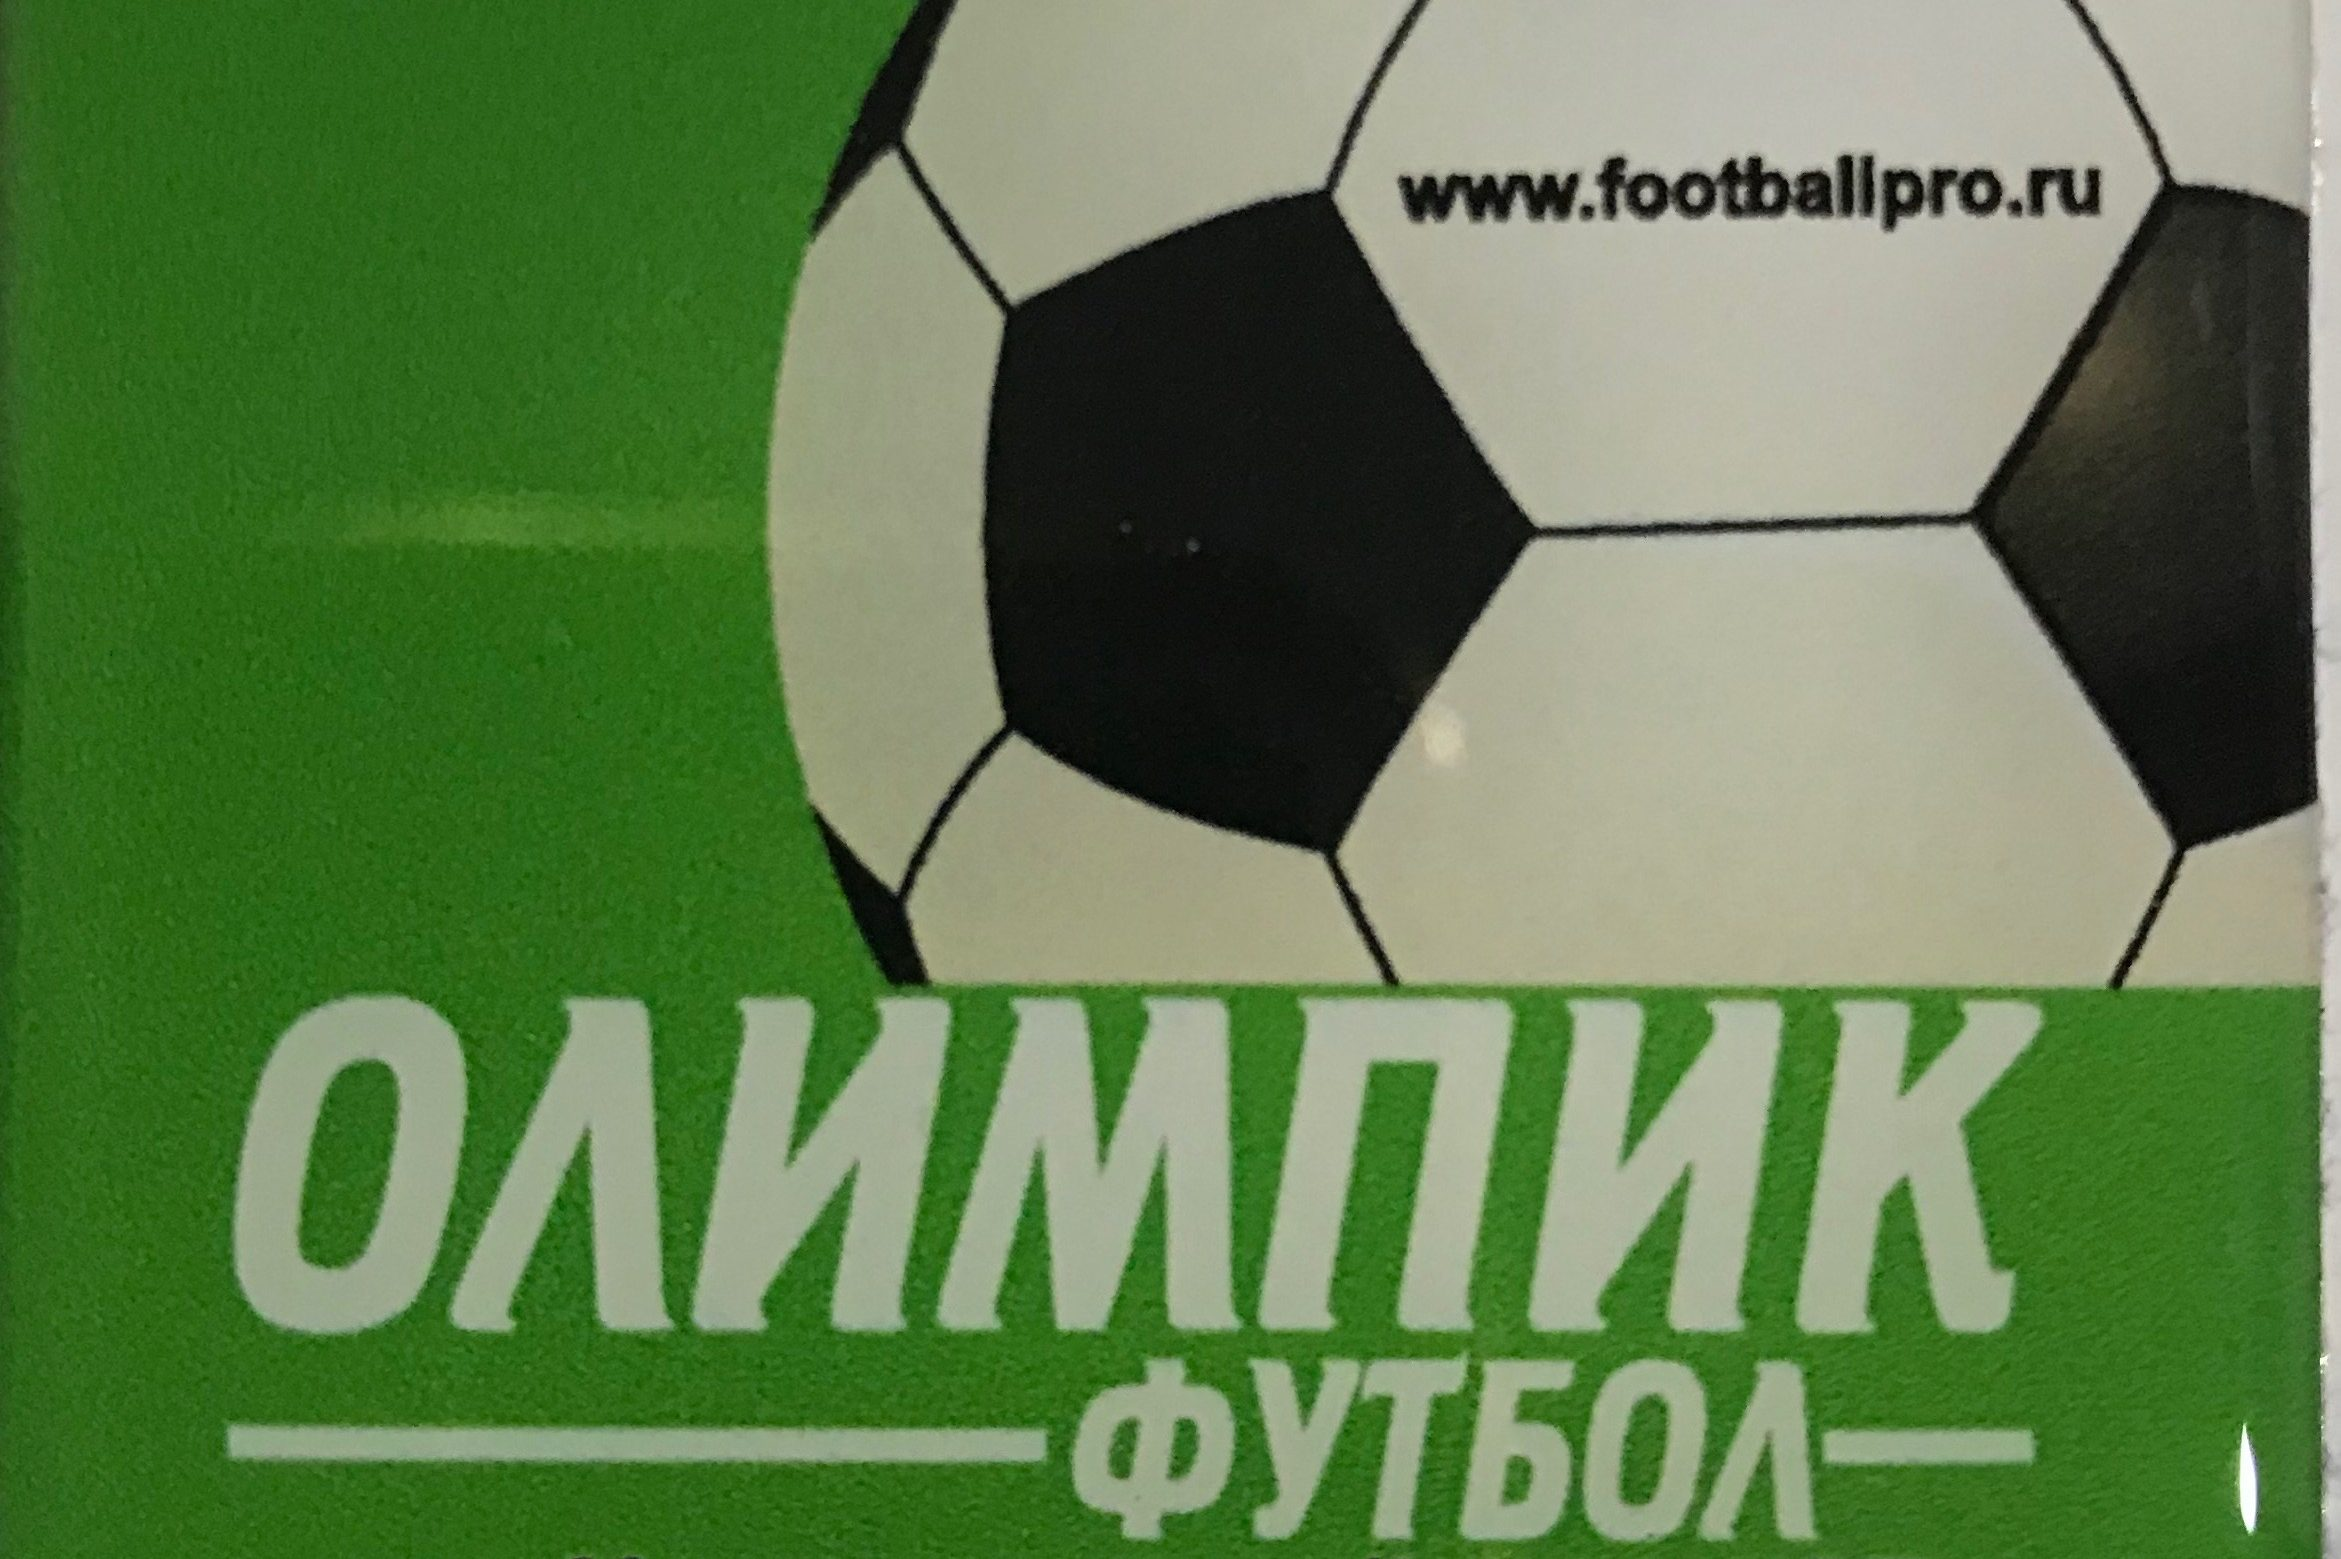 Олимпик Футбол